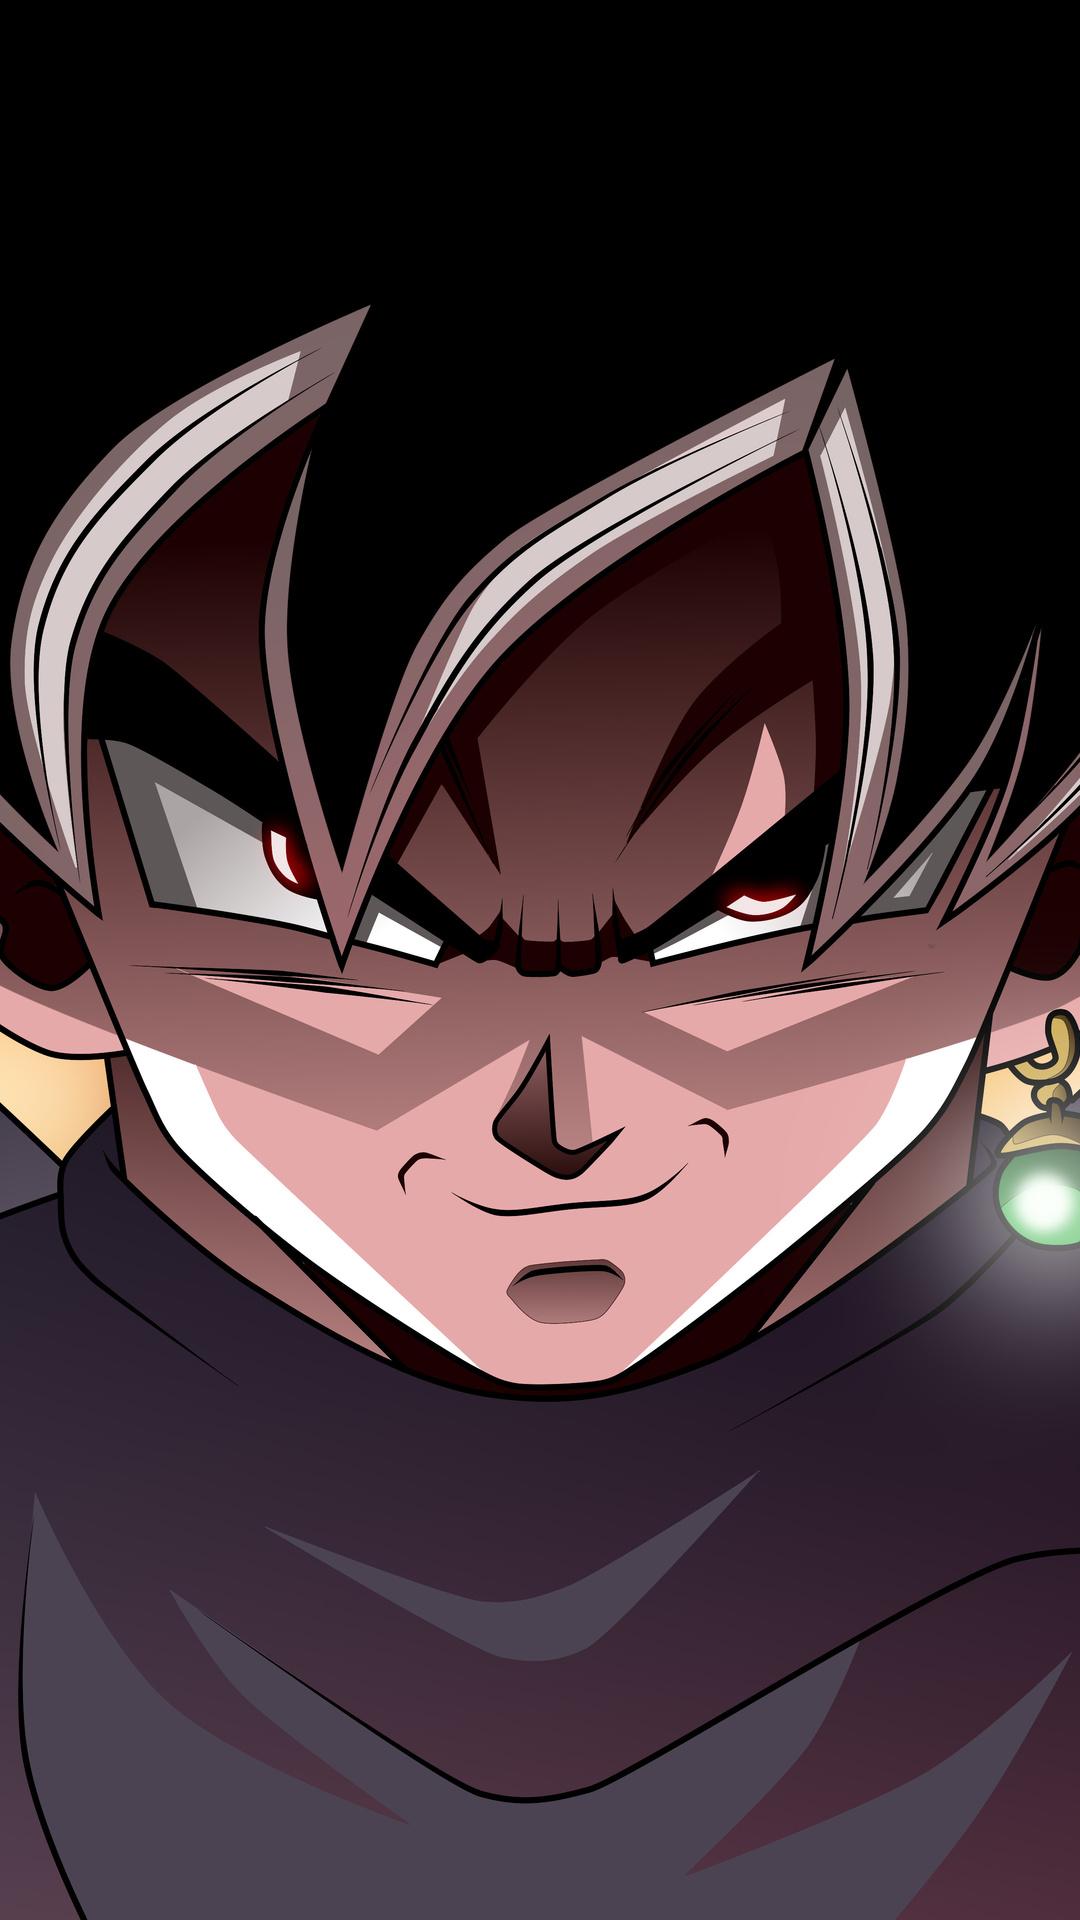 1080x1920 Black Goku Dragon Ball Super 8k Iphone 7 6s 6 Plus Pixel